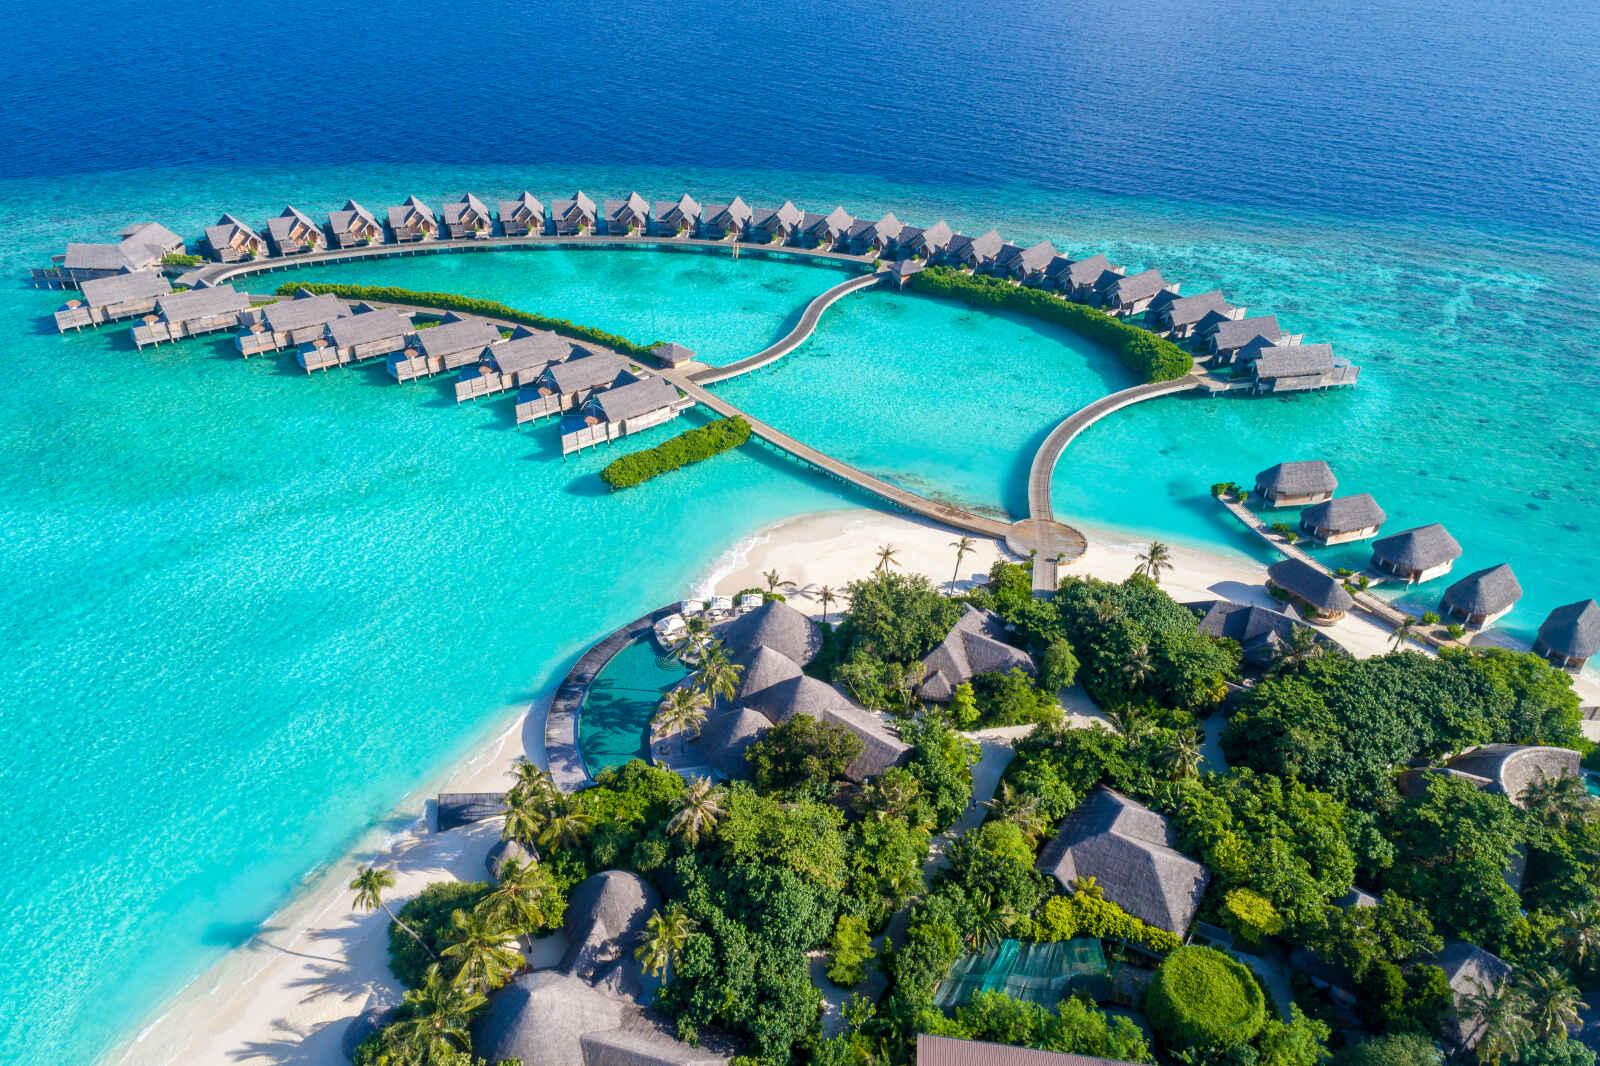 Maldives : Milaidhoo Island Maldives